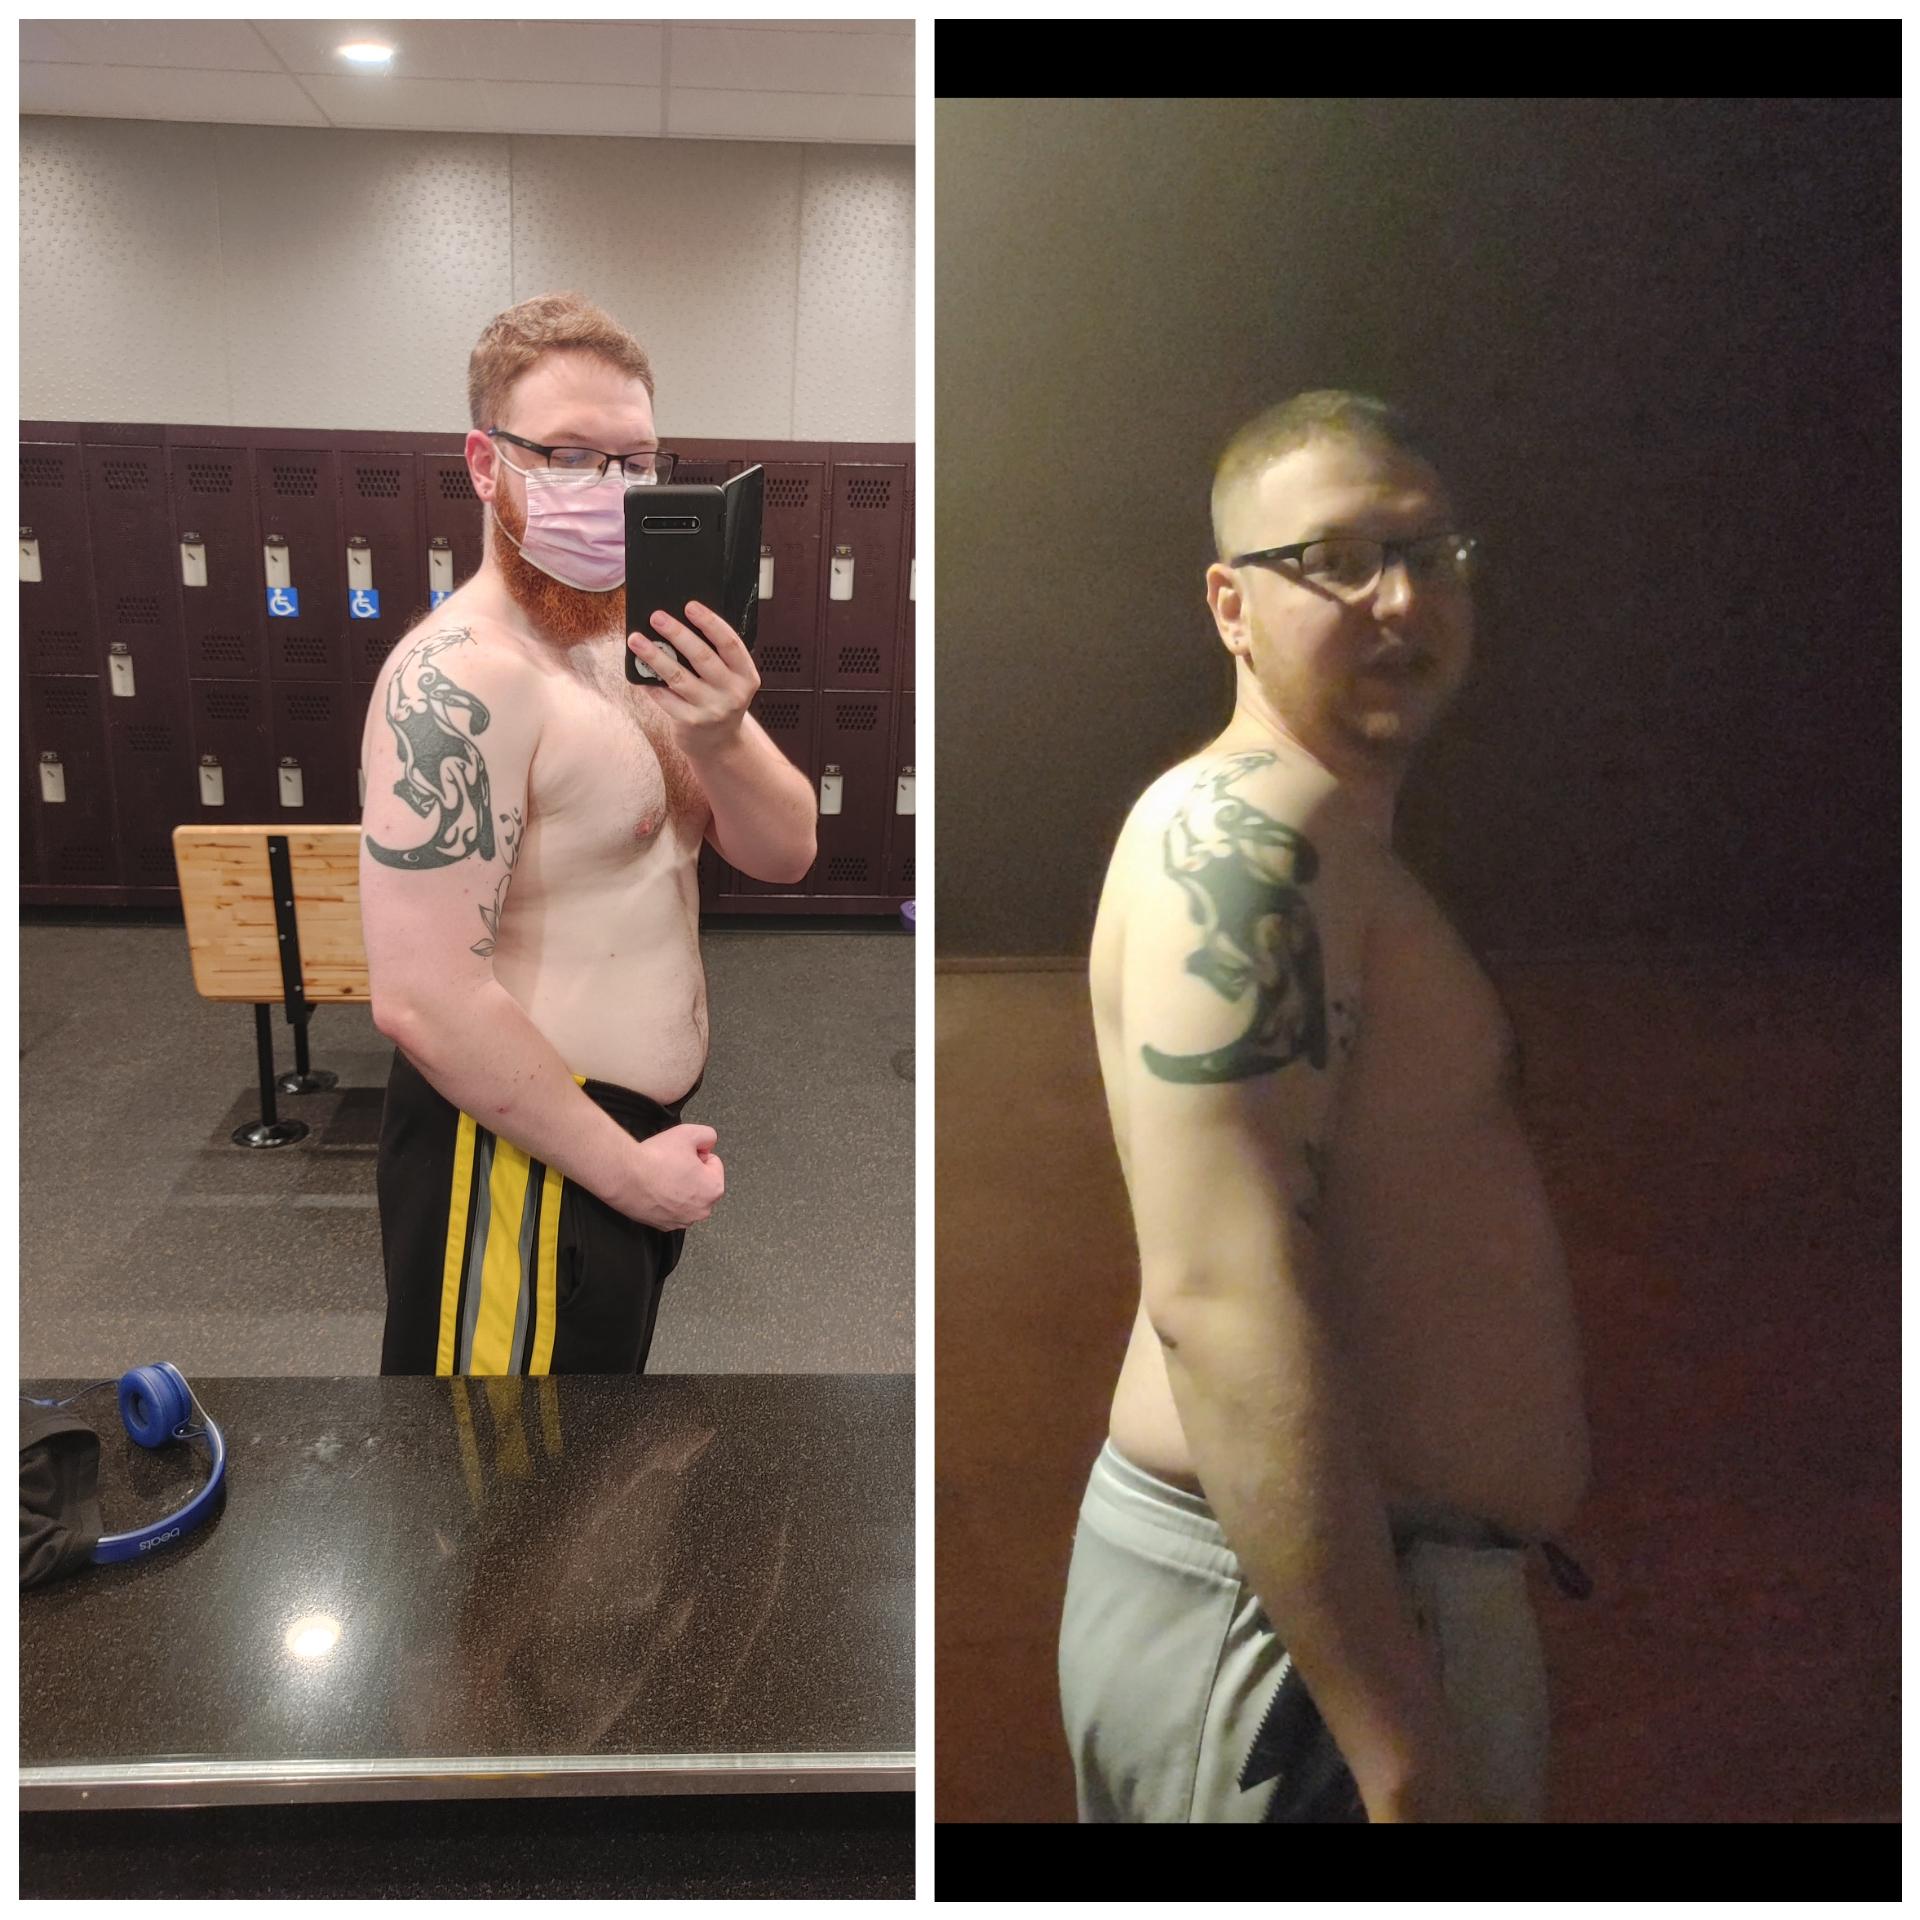 Progress Pics of 5 lbs Weight Loss 5 feet 11 Male 230 lbs to 225 lbs